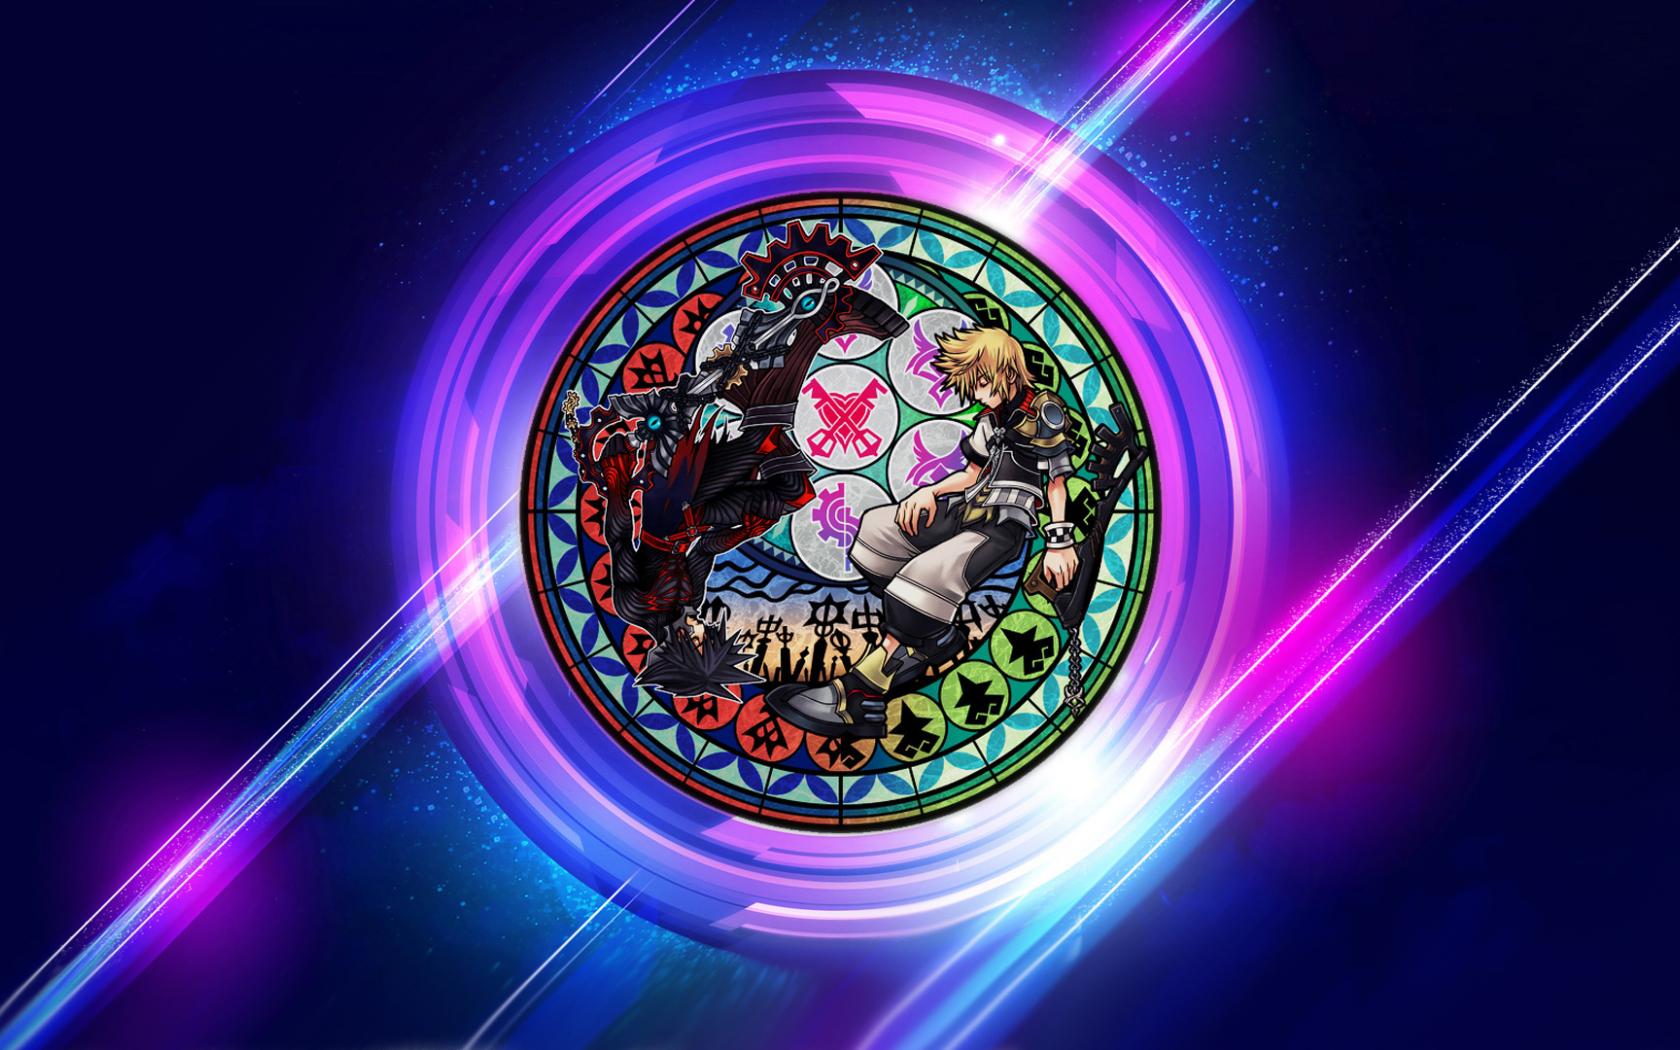 Free Download Kingdom Hearts 3 Wallpaper For Desktop 6928811